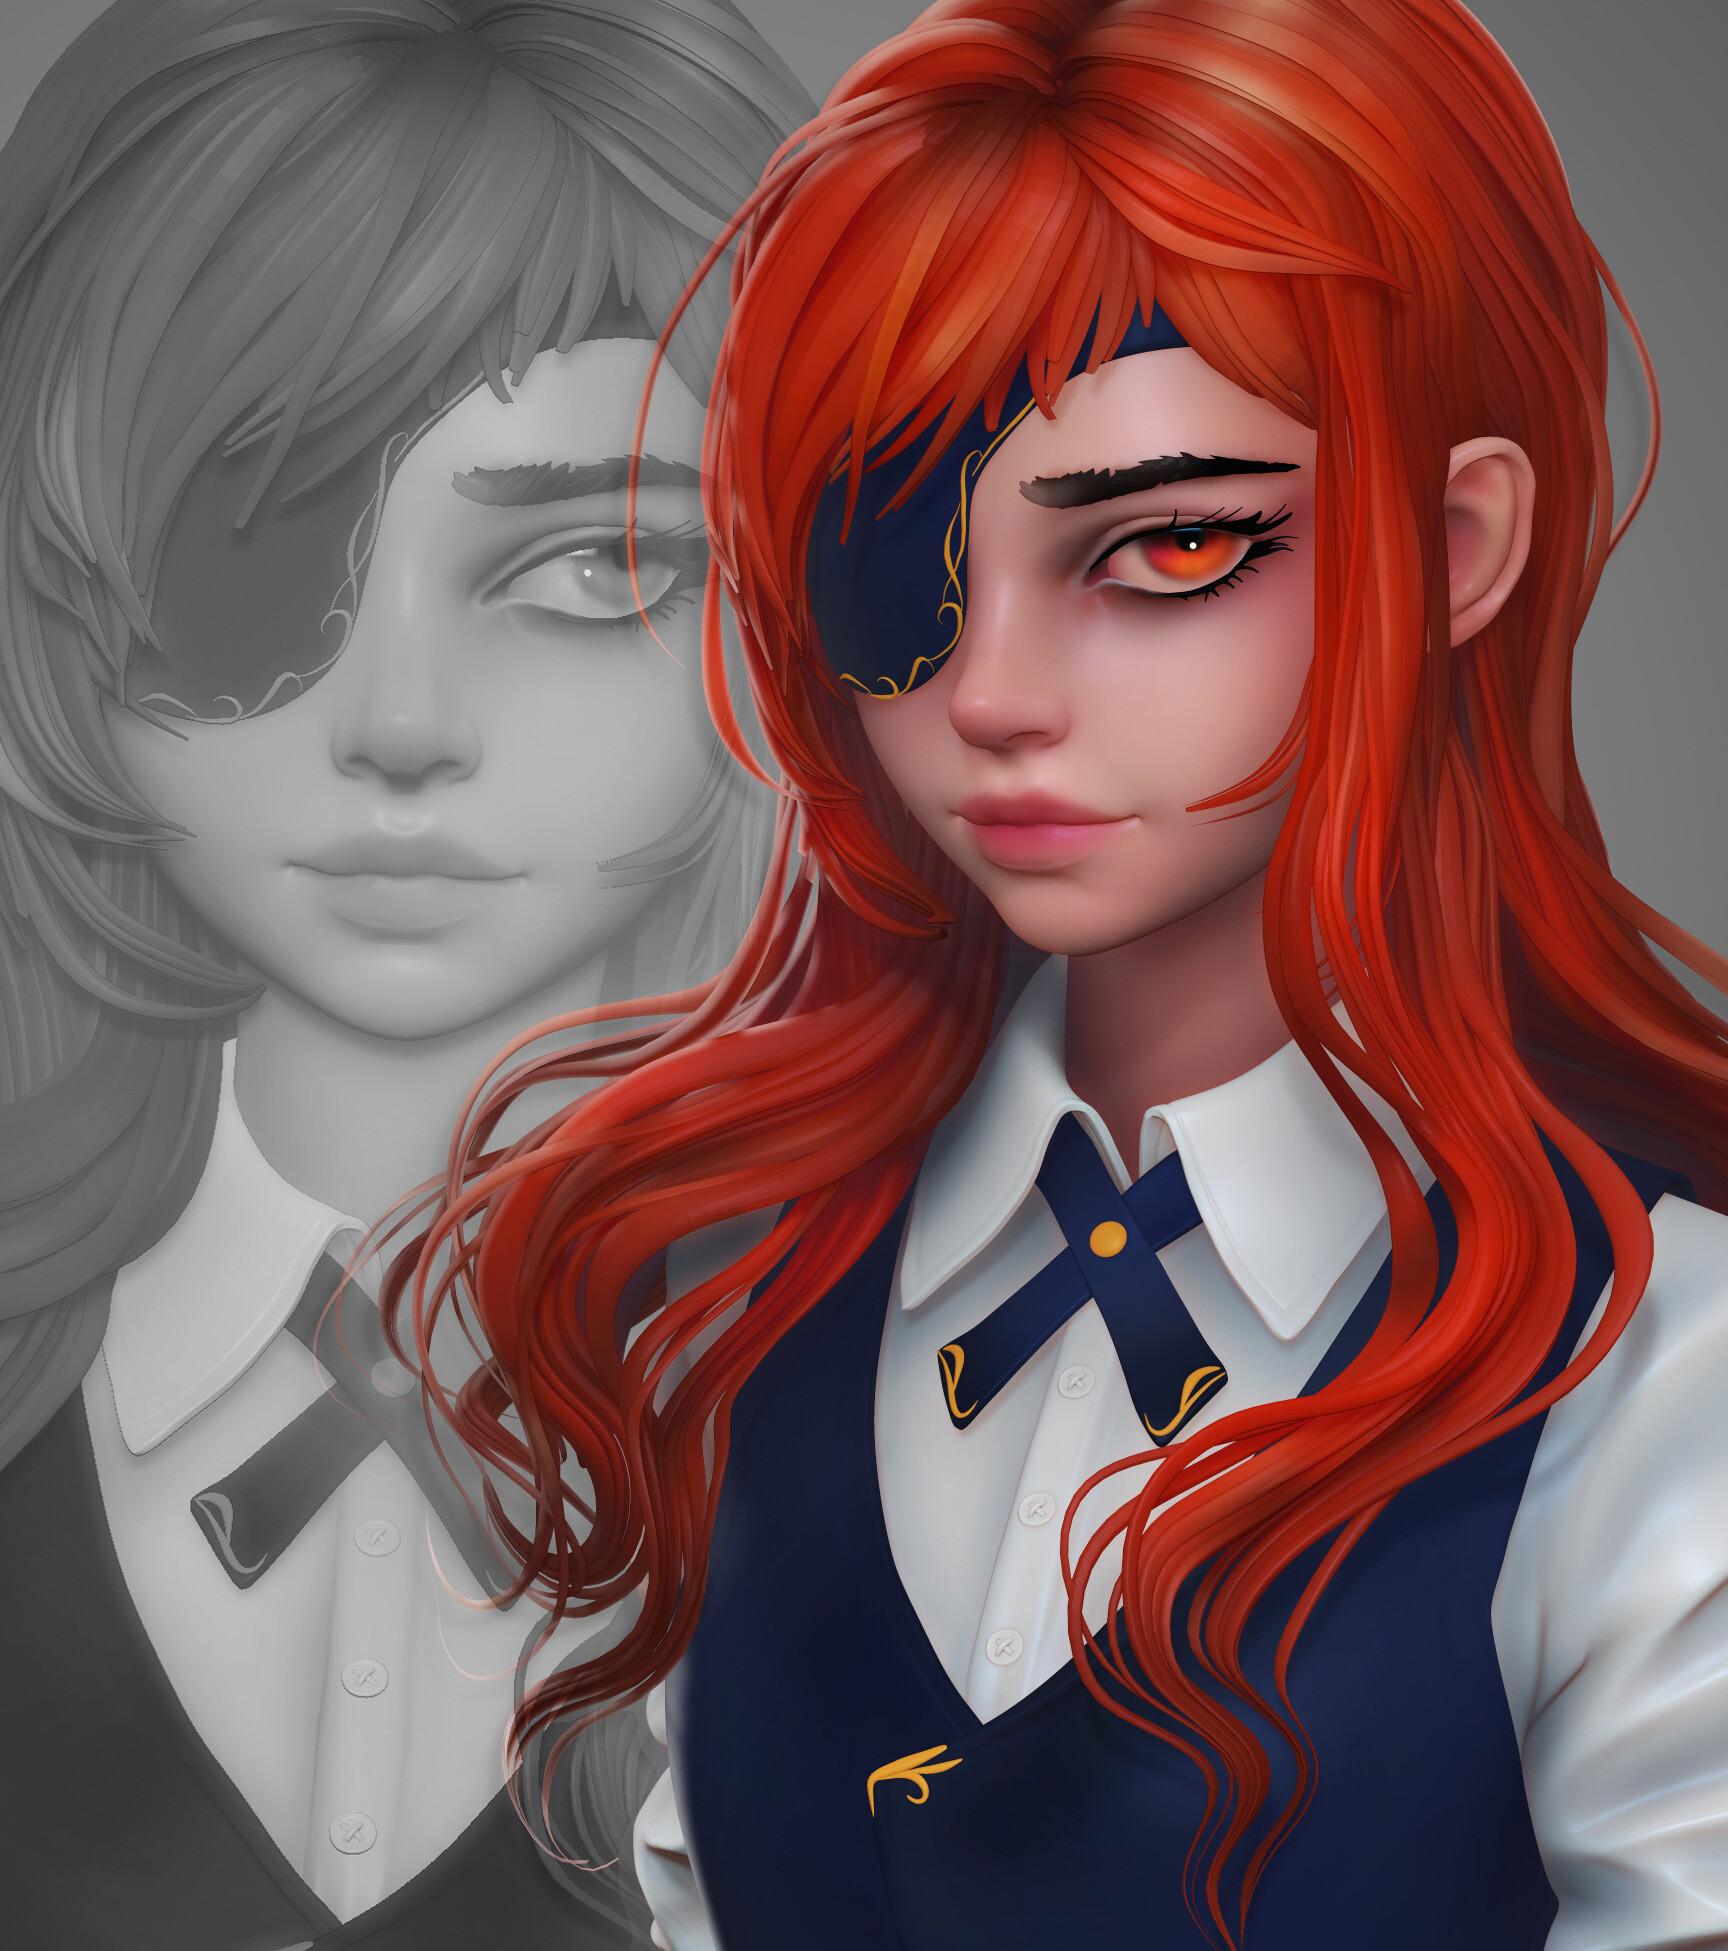 ArtStation - Cyber Hunters Zero 3d, Olya Anufrieva | 3d